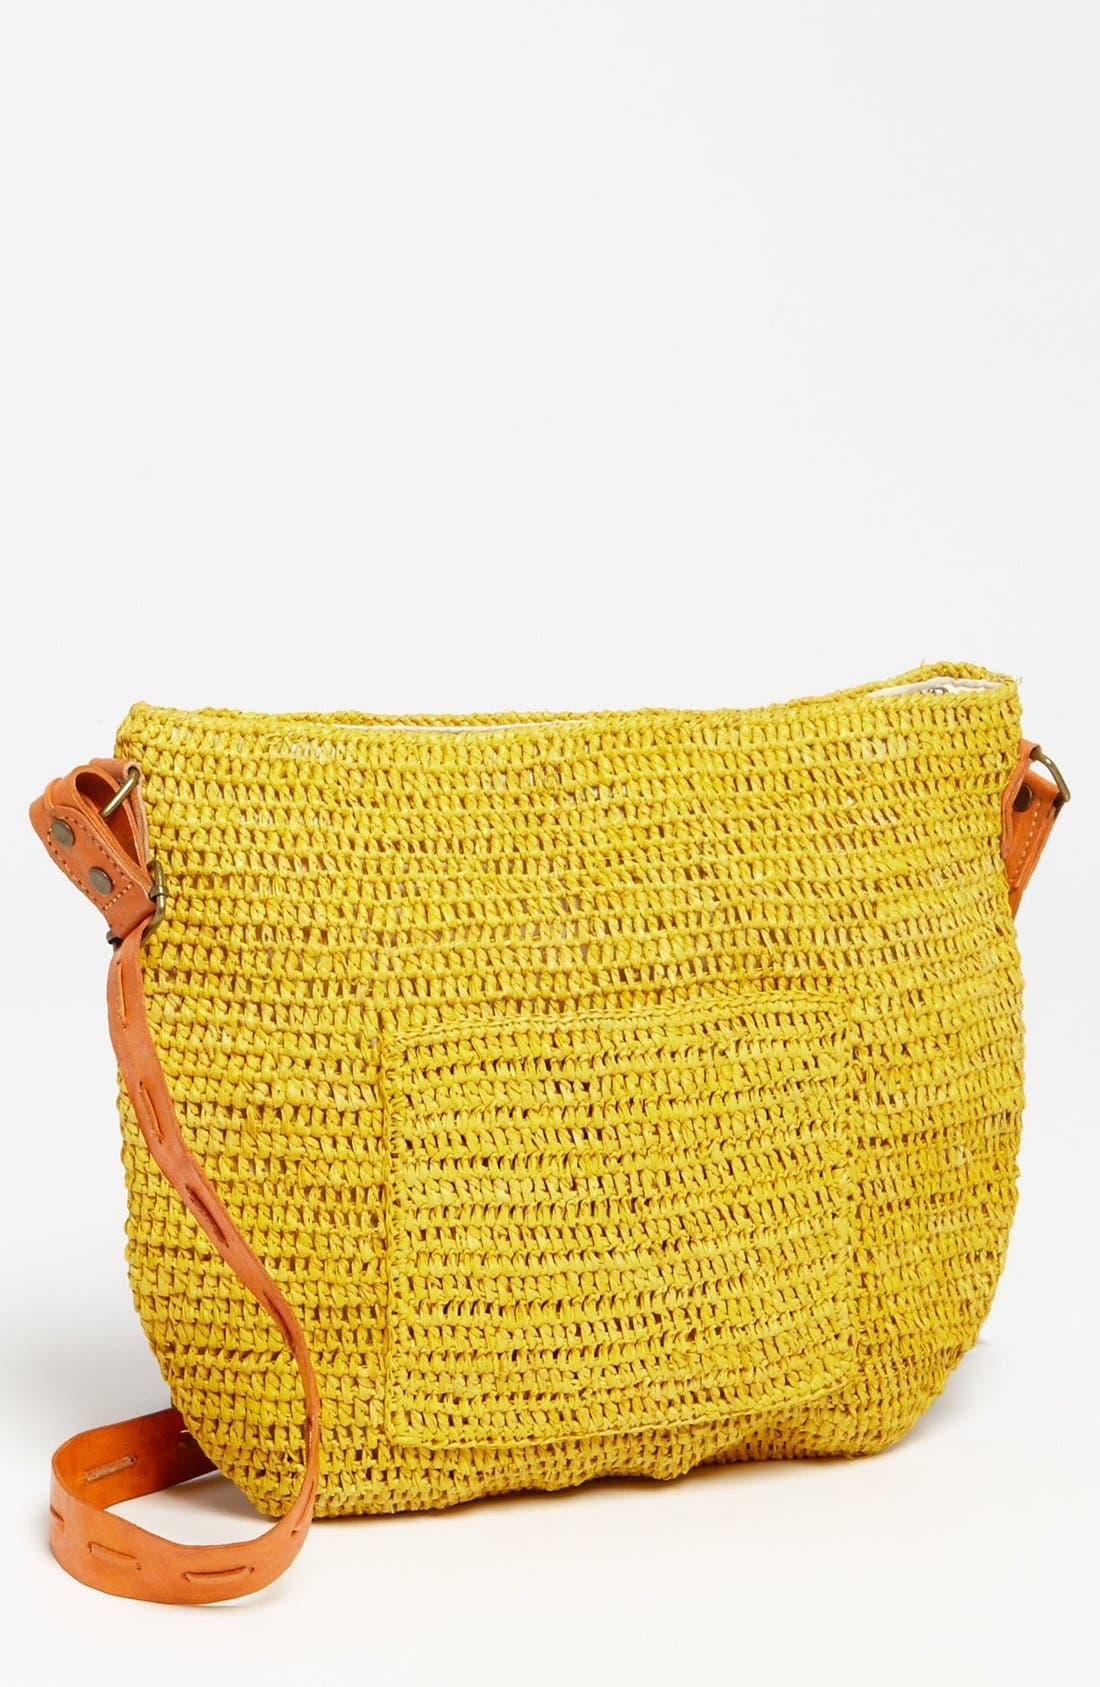 Alternate Image 1 Selected - Mar y Sol 'Sydney' Crocheted Crossbody Bag